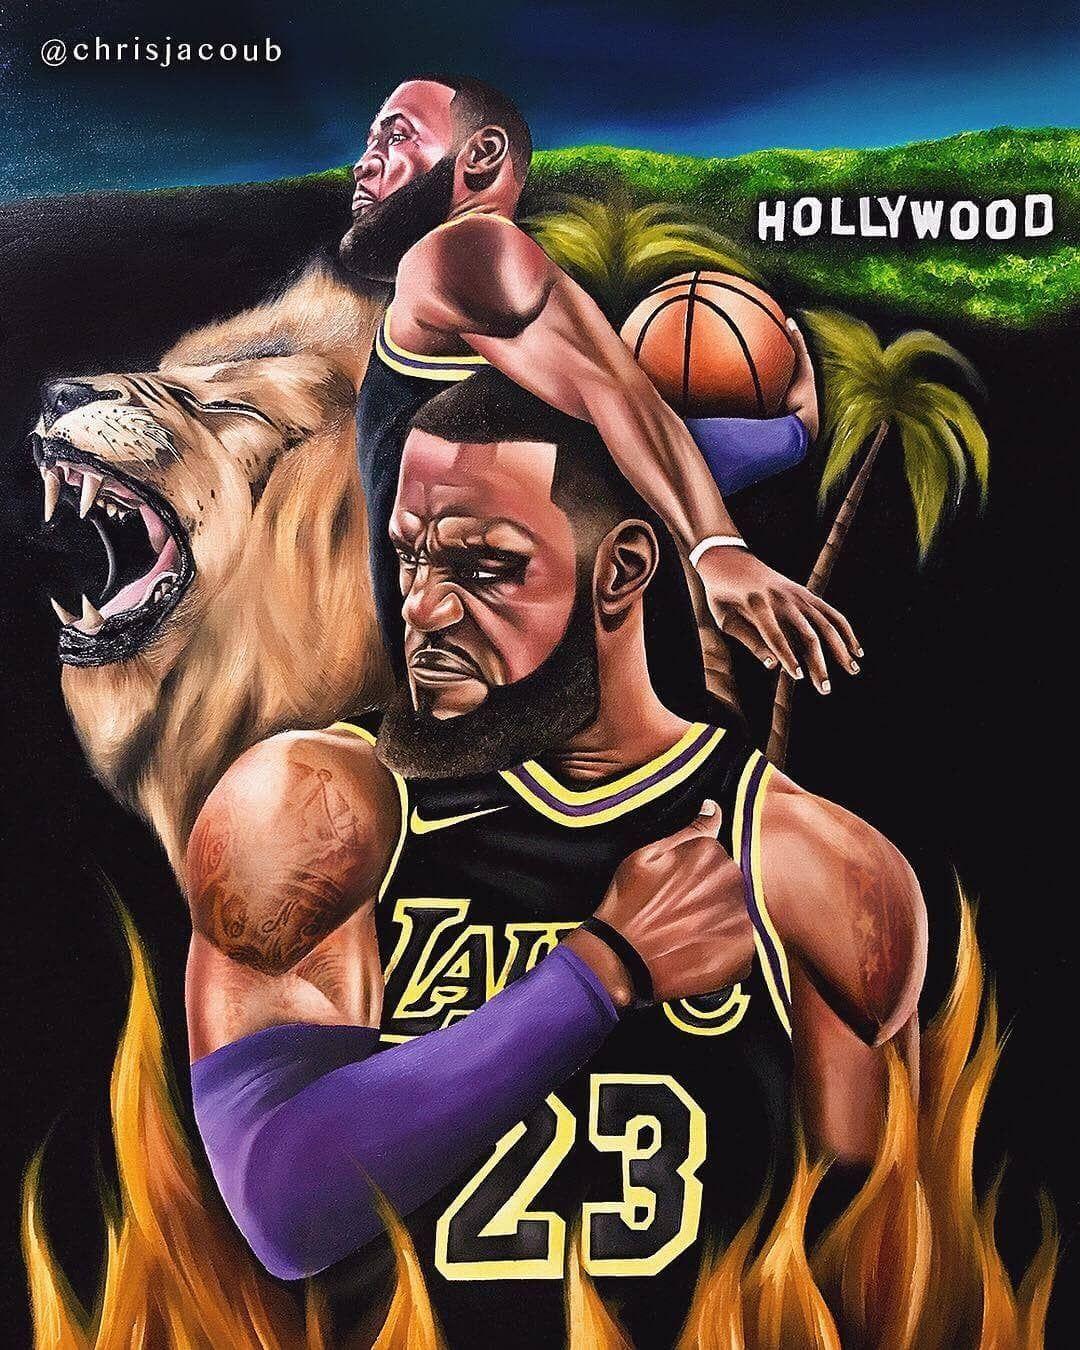 Lebron desktop wallpaper: Lebron James Cartoon Wallpaper